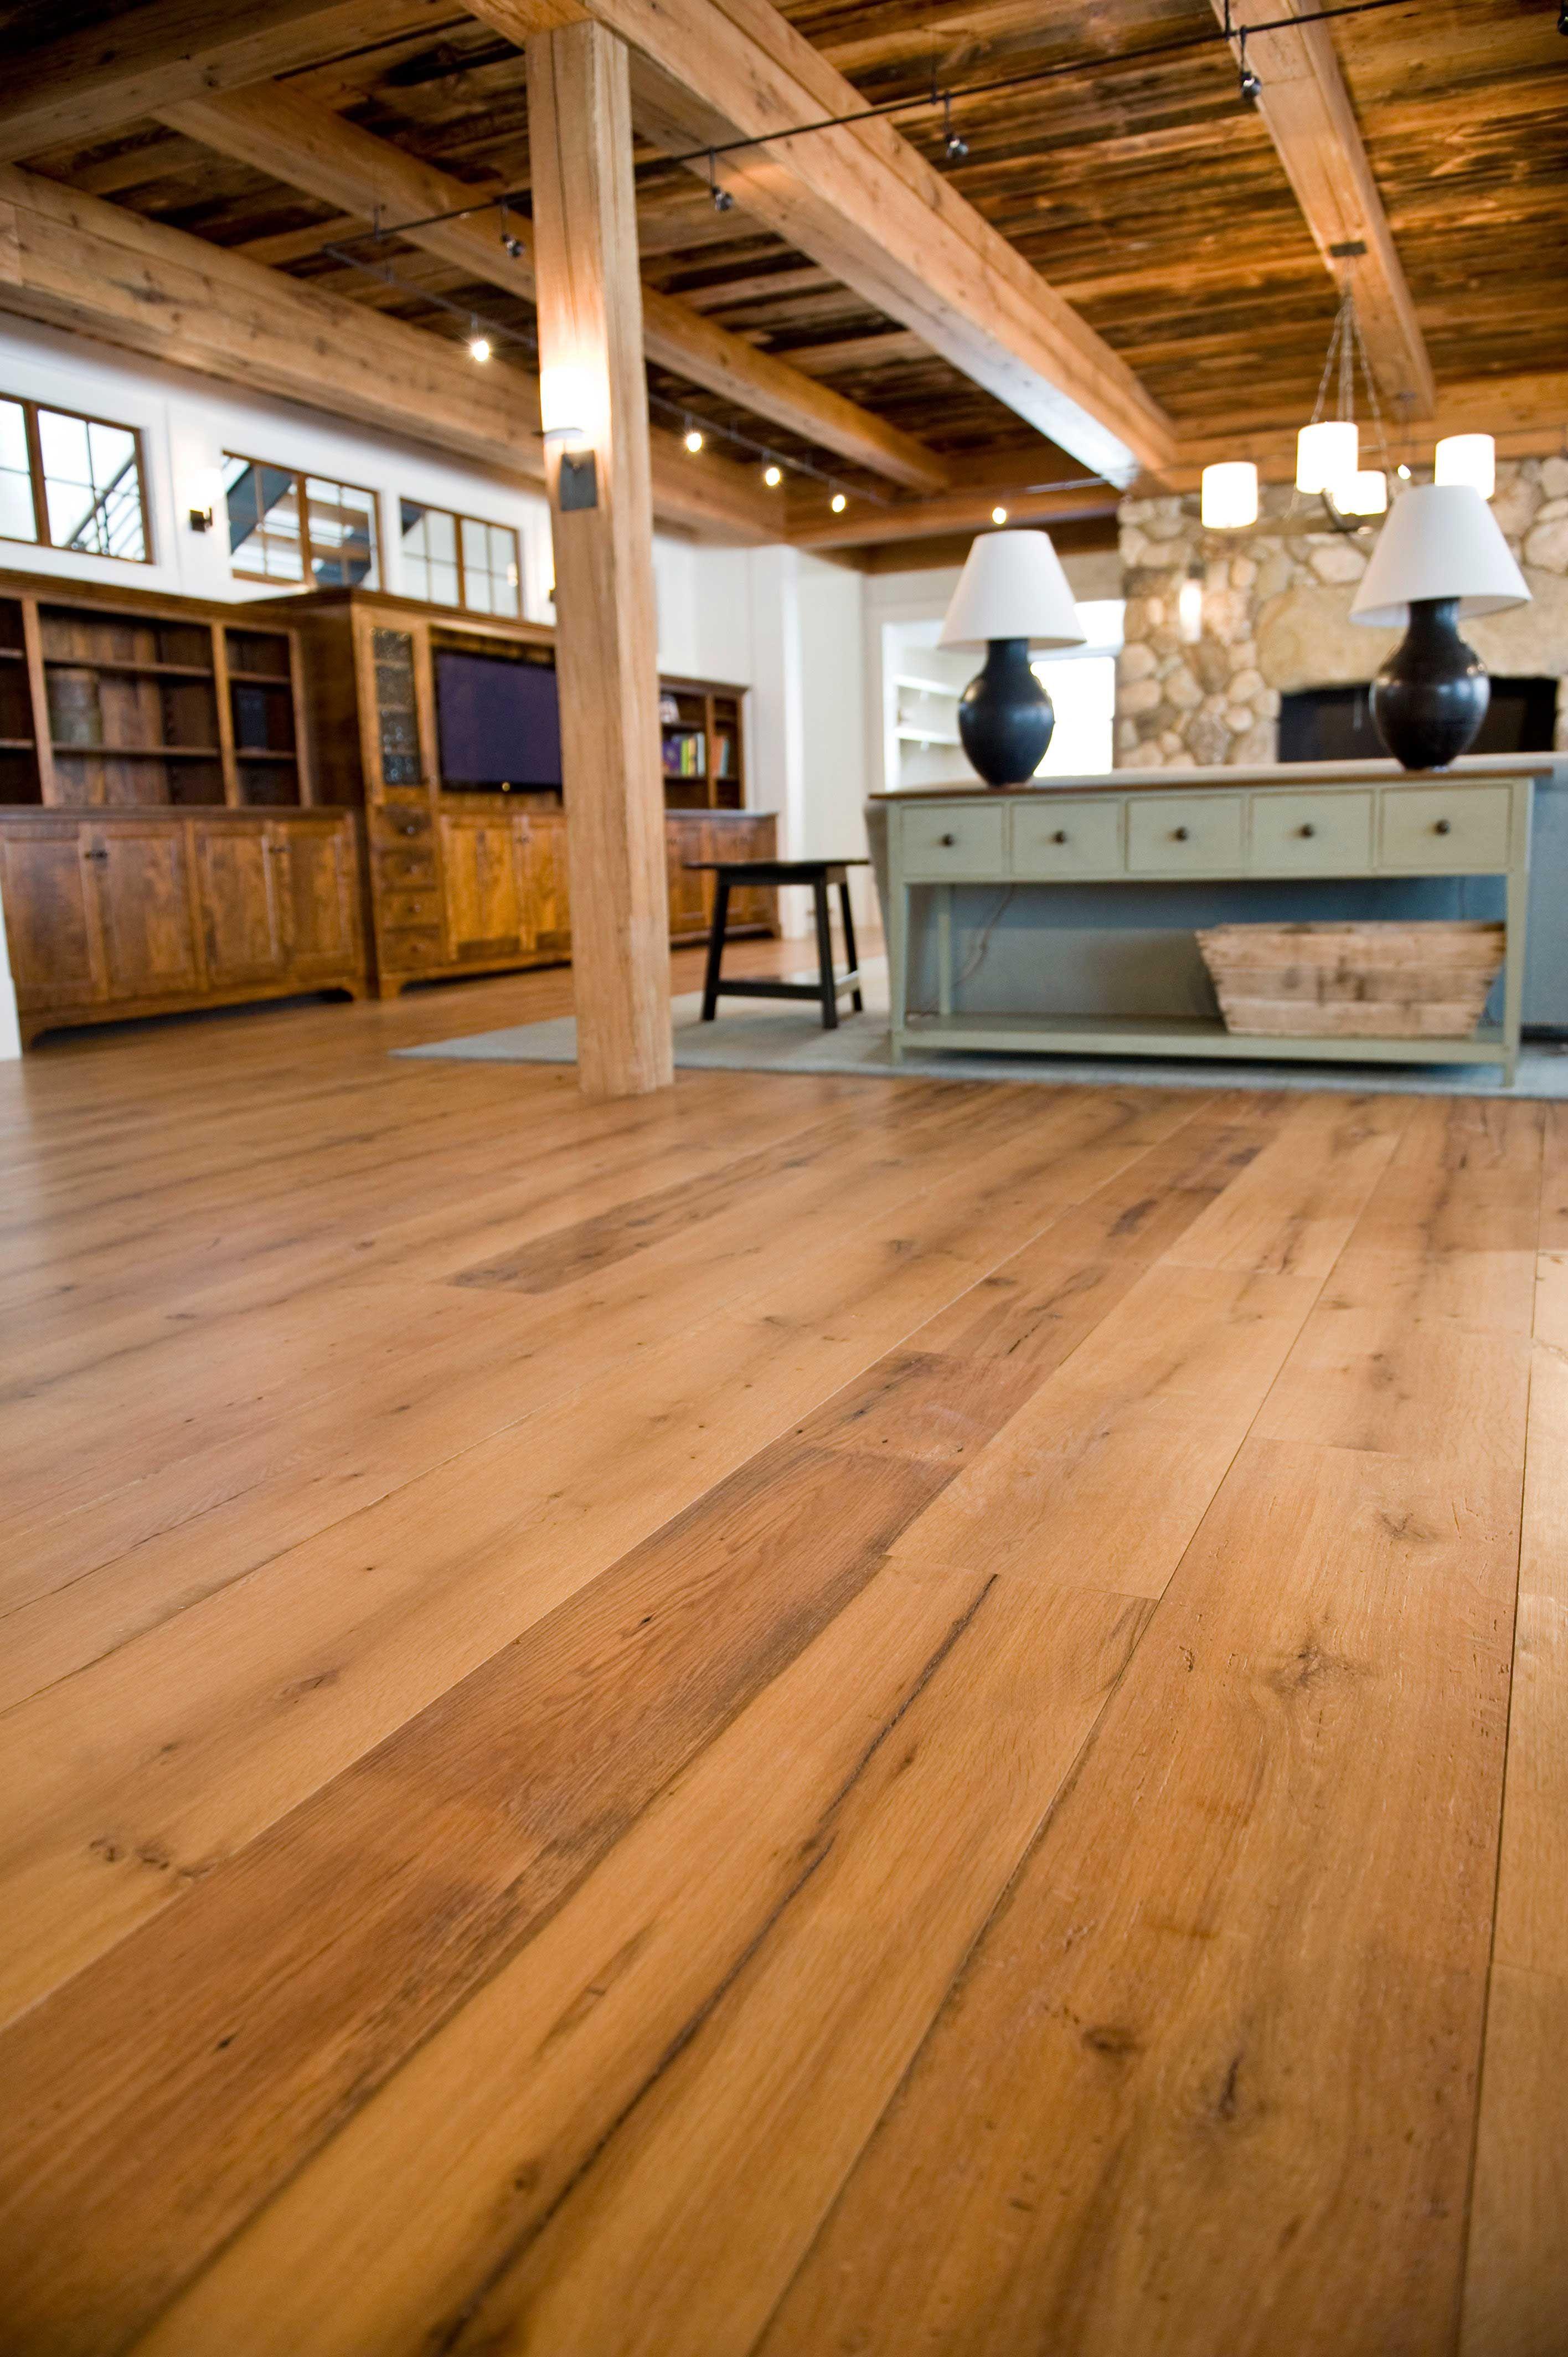 Reclaimed Wood Floors